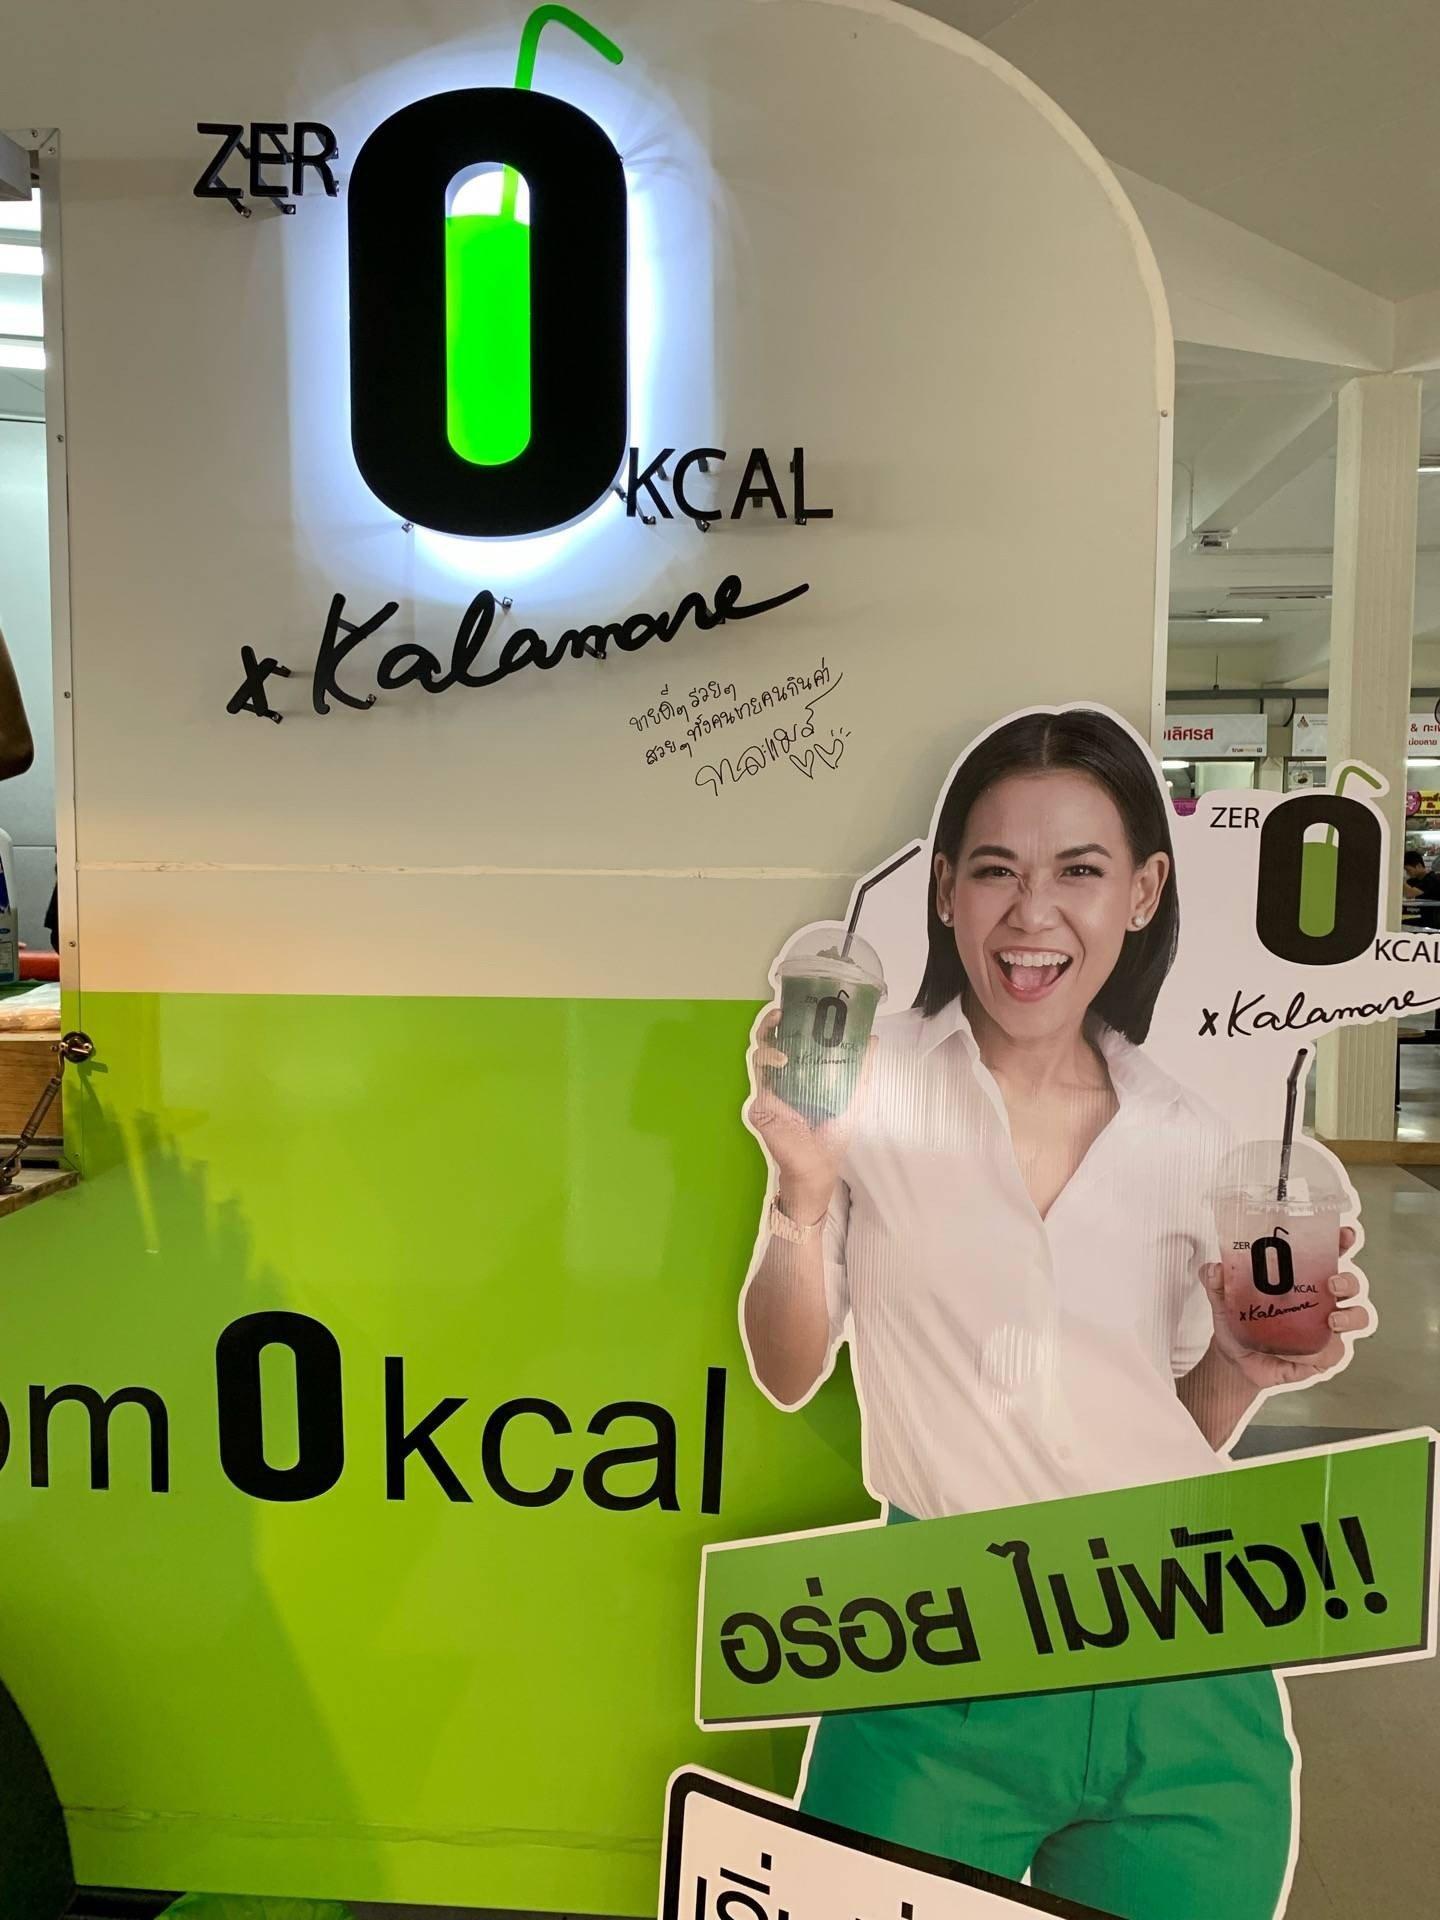 Zero kcal x kalamare มหาวิทยาลัยขอนแก่น